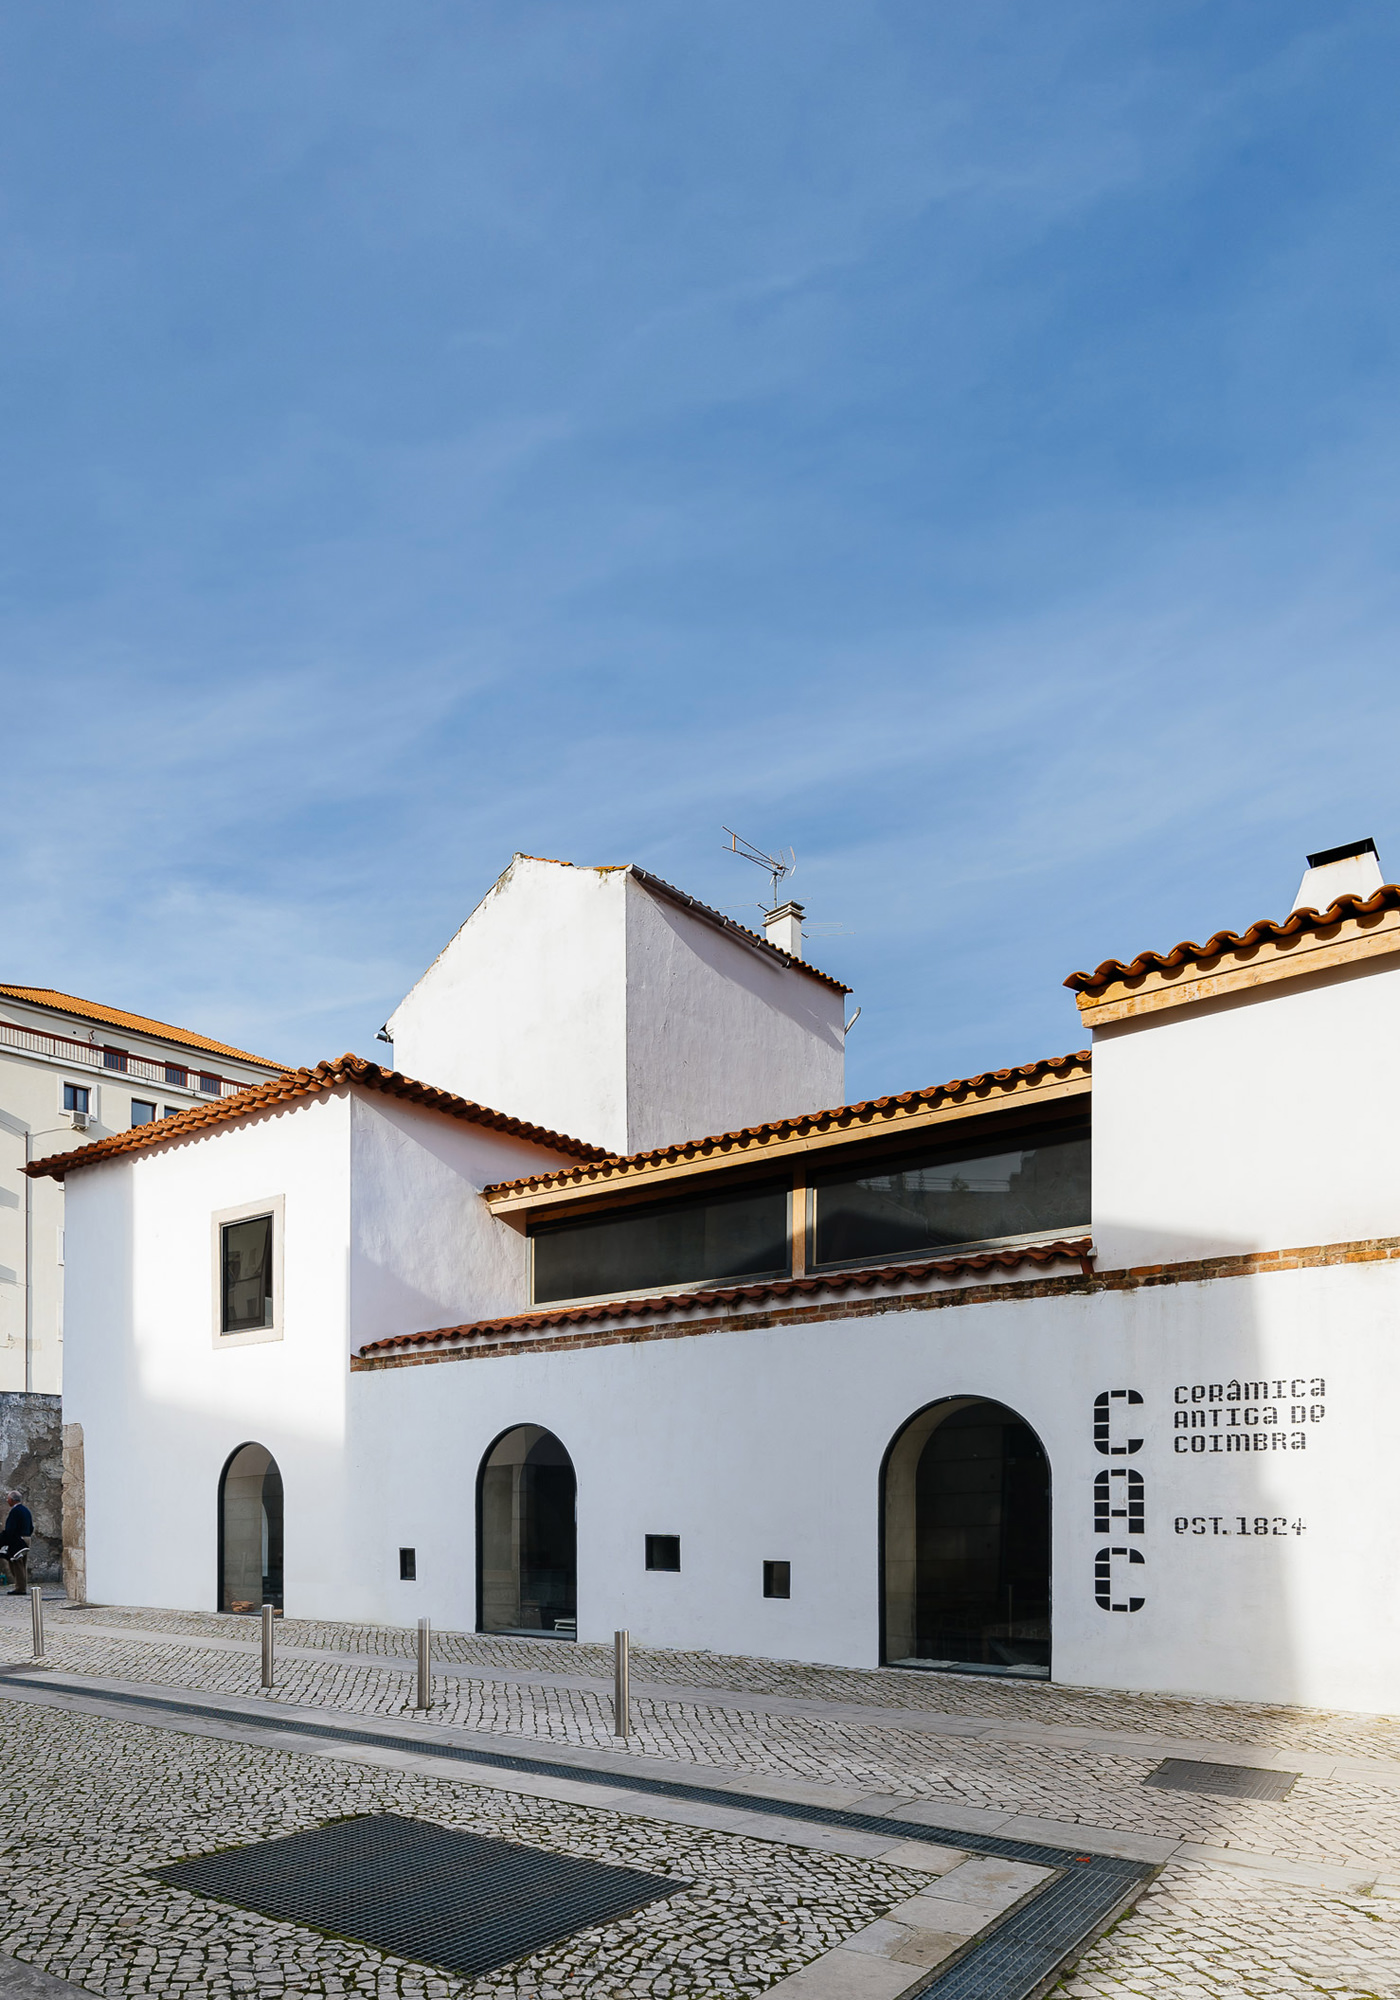 City Guide Coimbra Ceramica Antiga - Atelier de Céramique de Coimbra